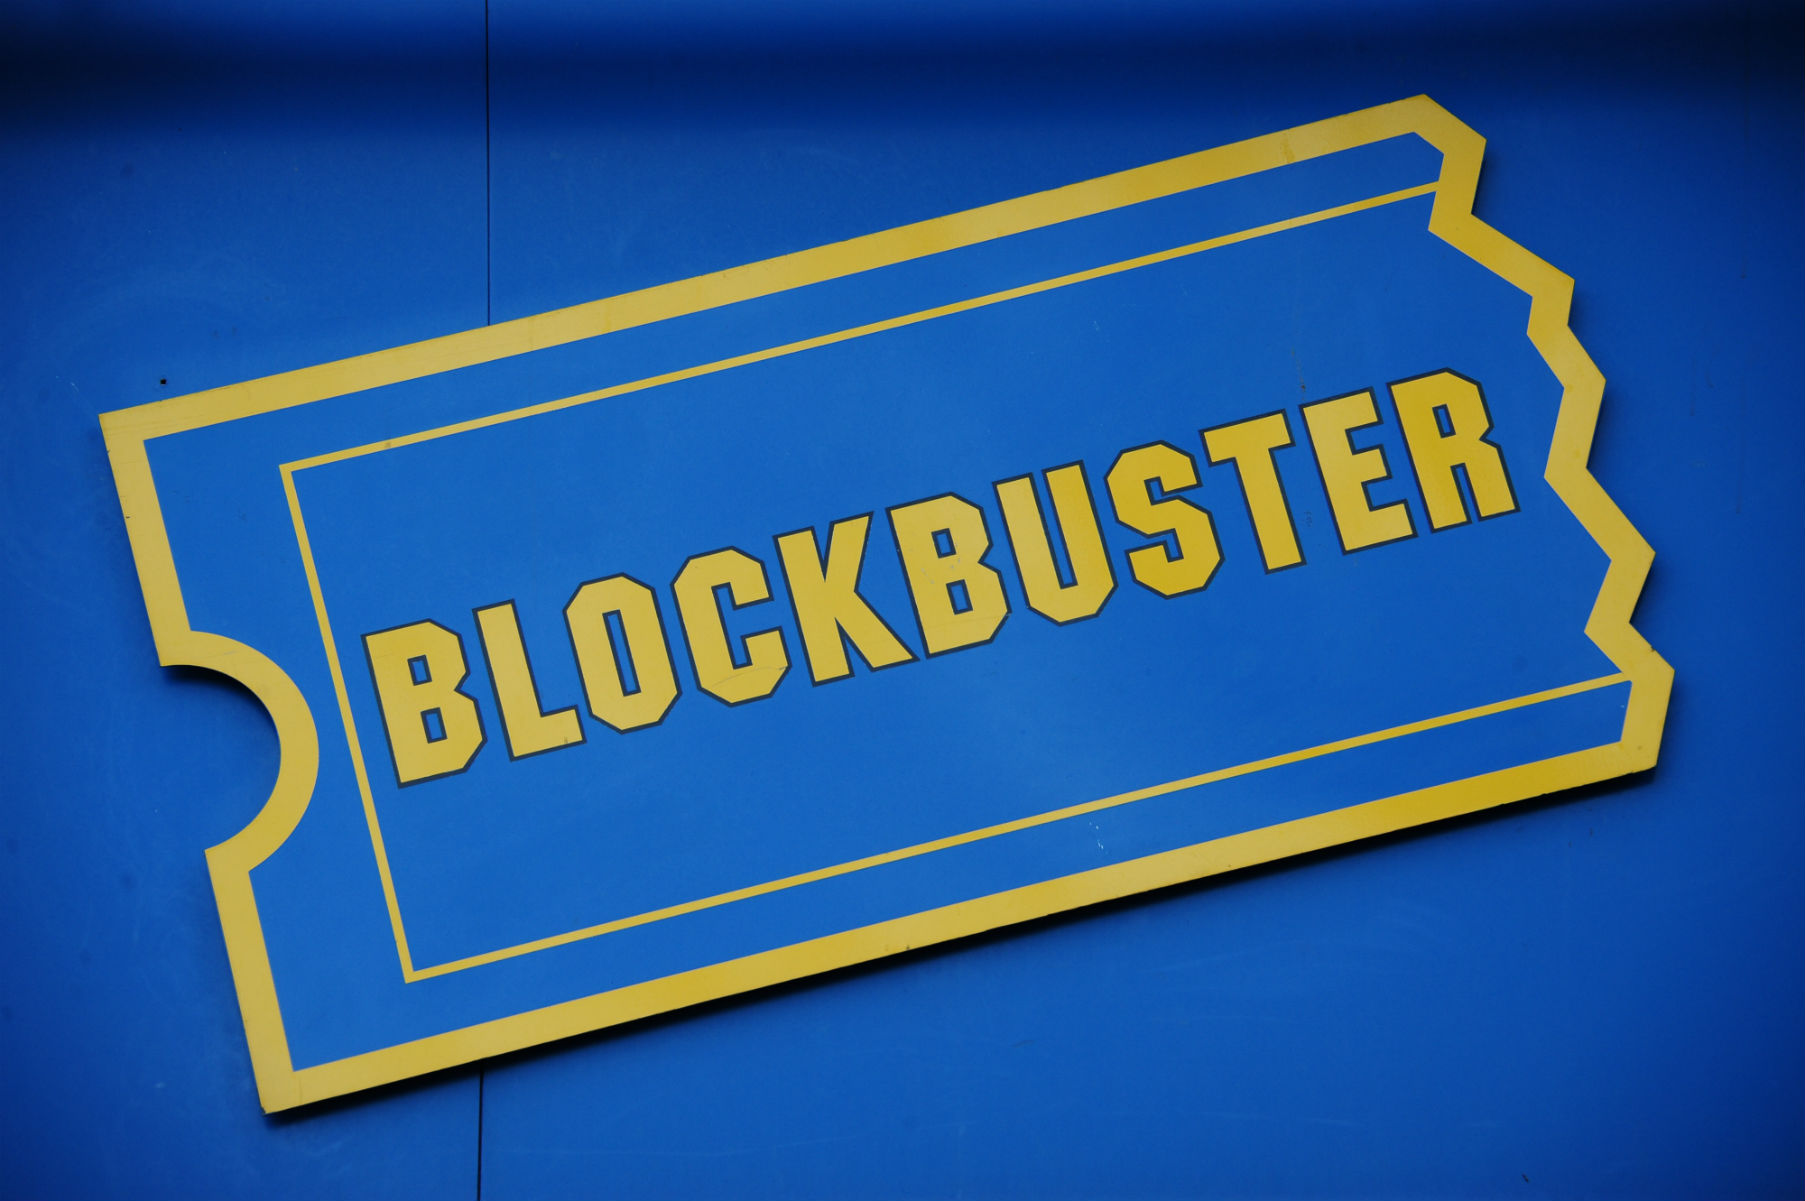 blockbuster, arbejde, ansatte, insider, viden, sjov